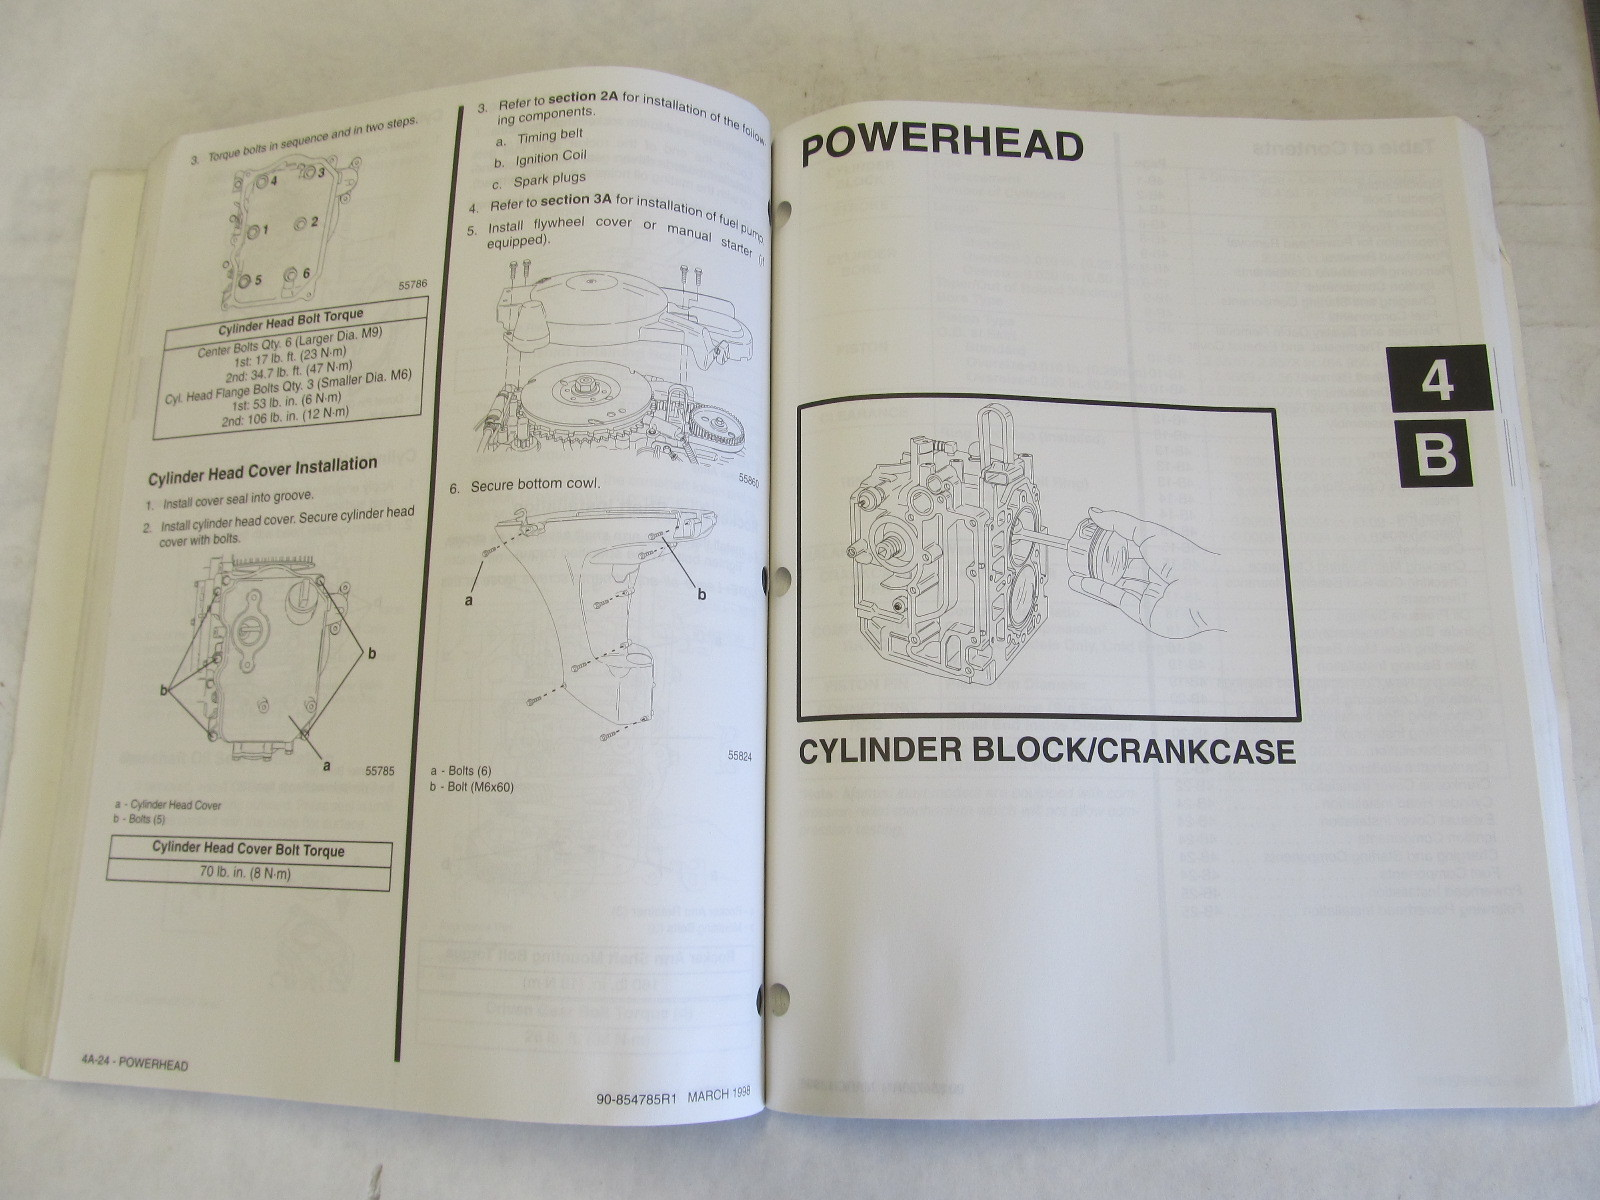 1998 mercury 25 hp outboard manual